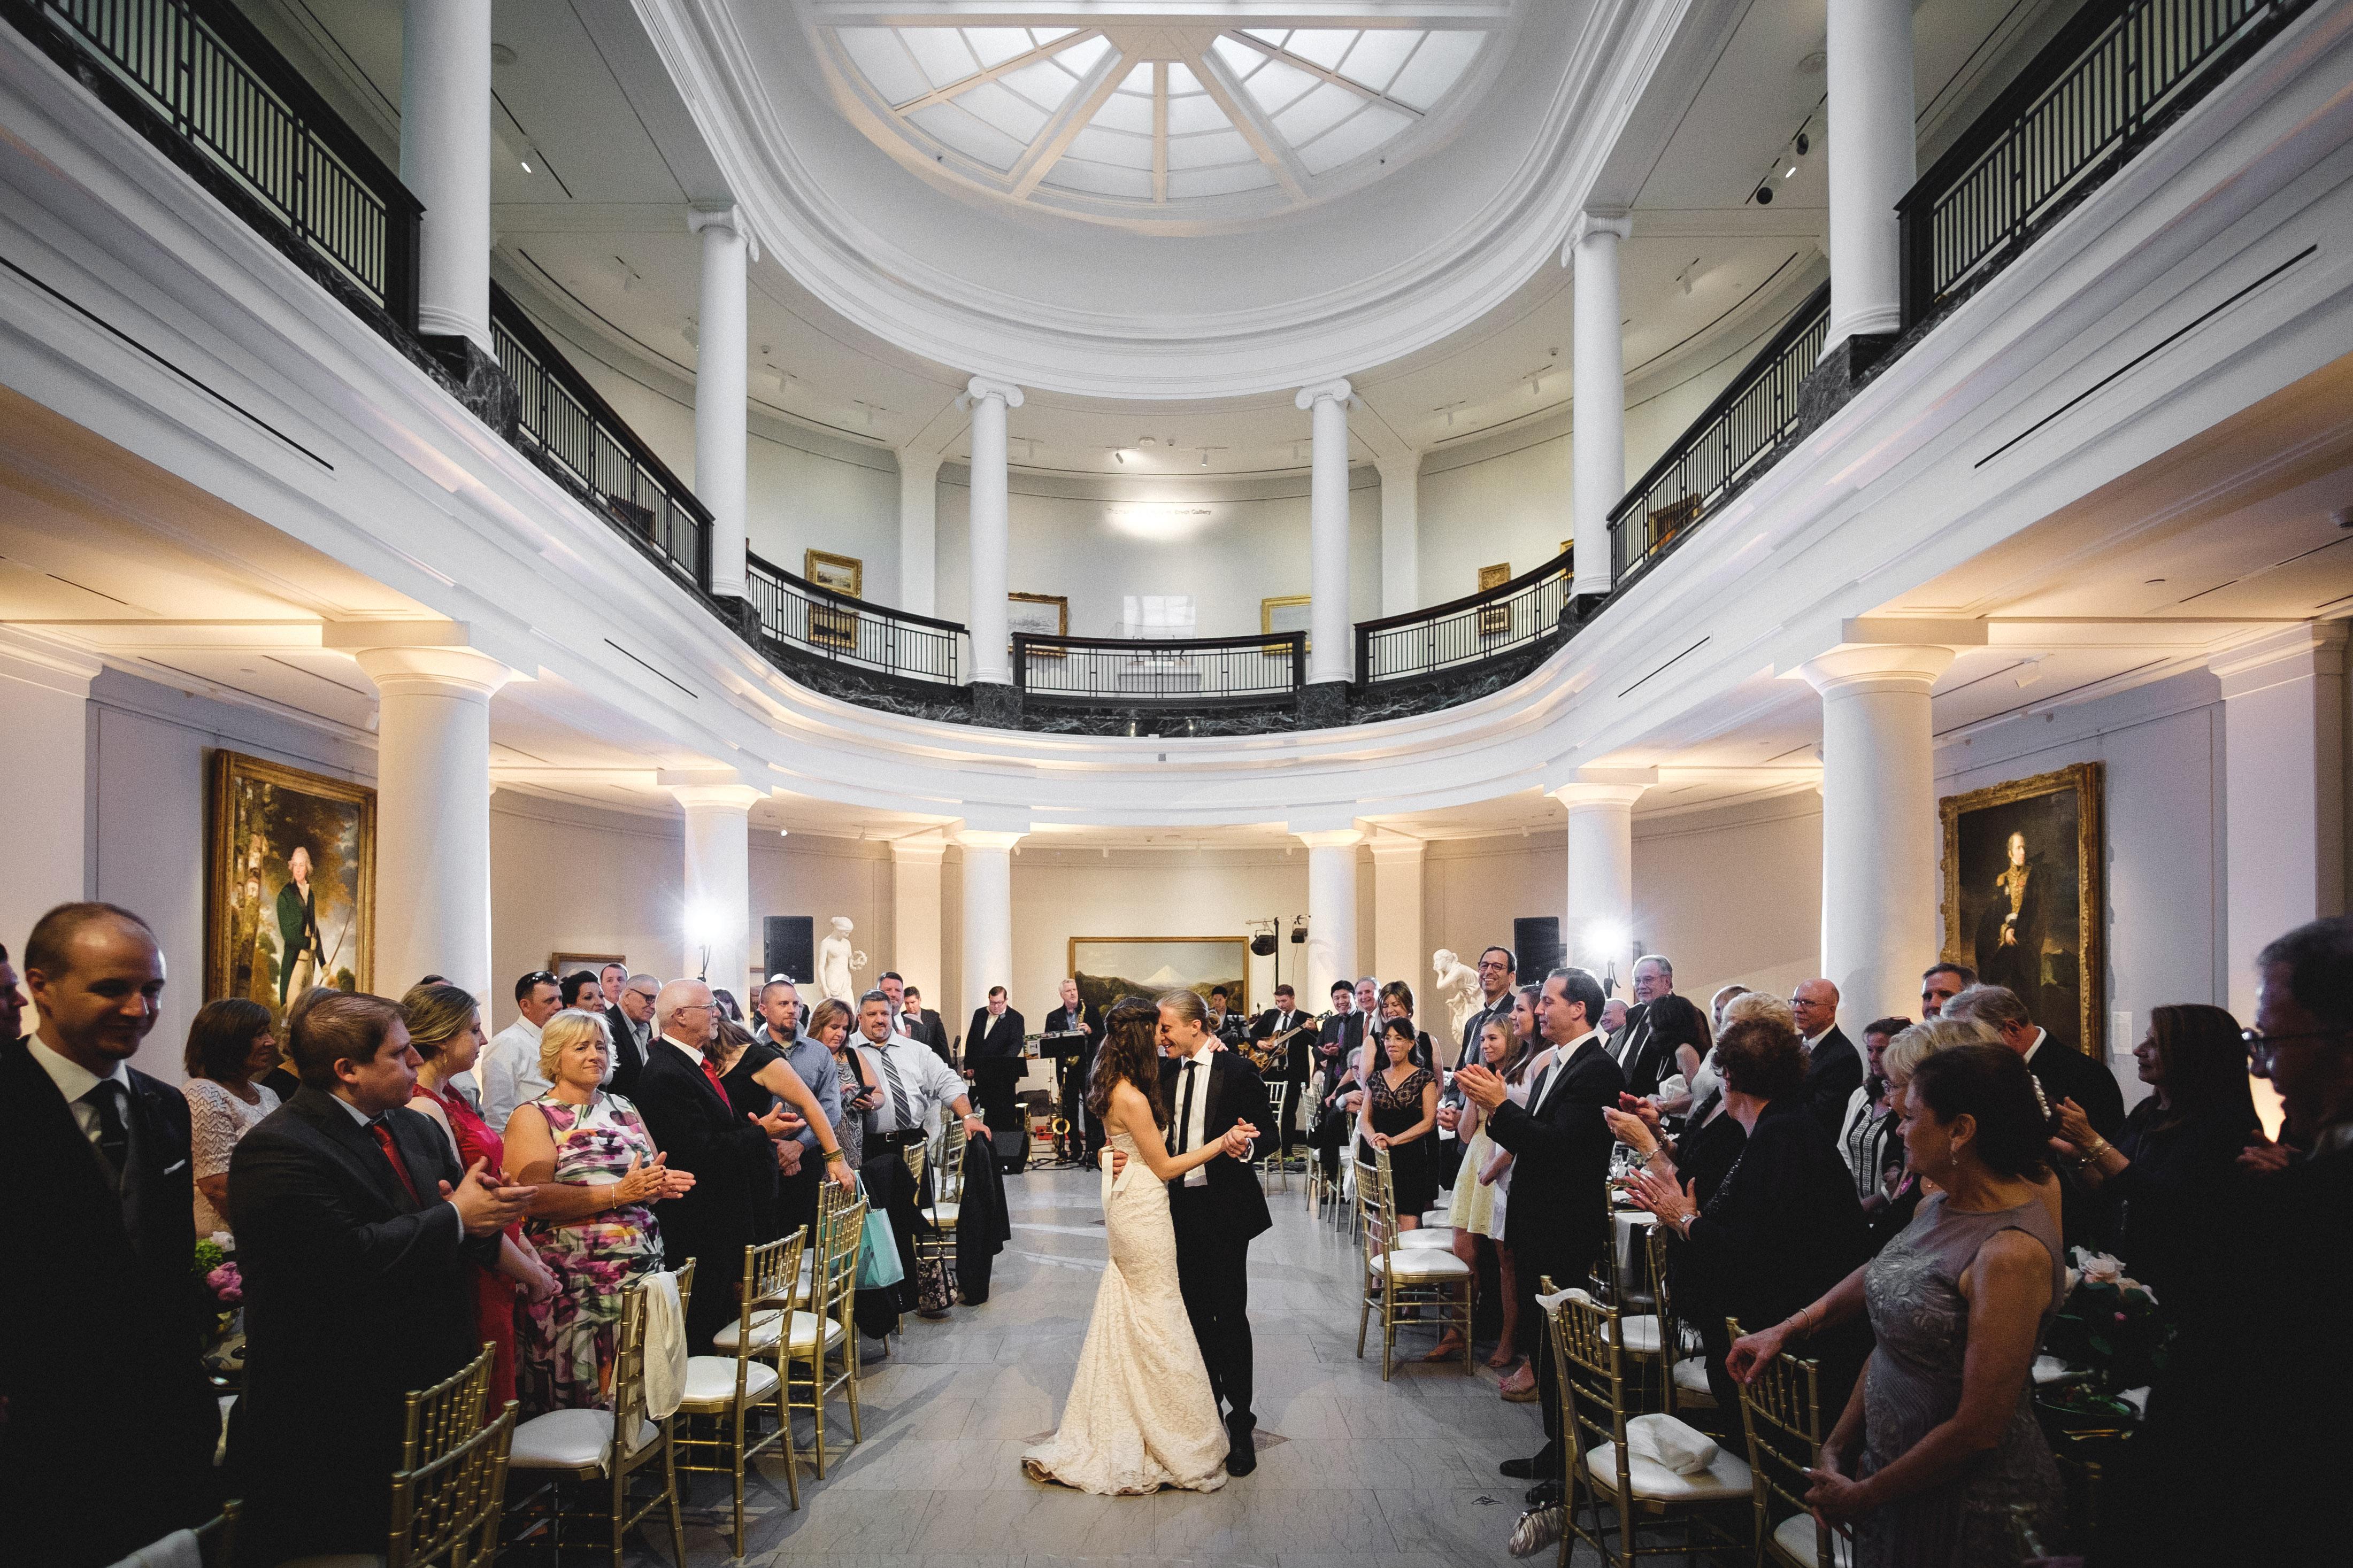 Weddings at UMMA